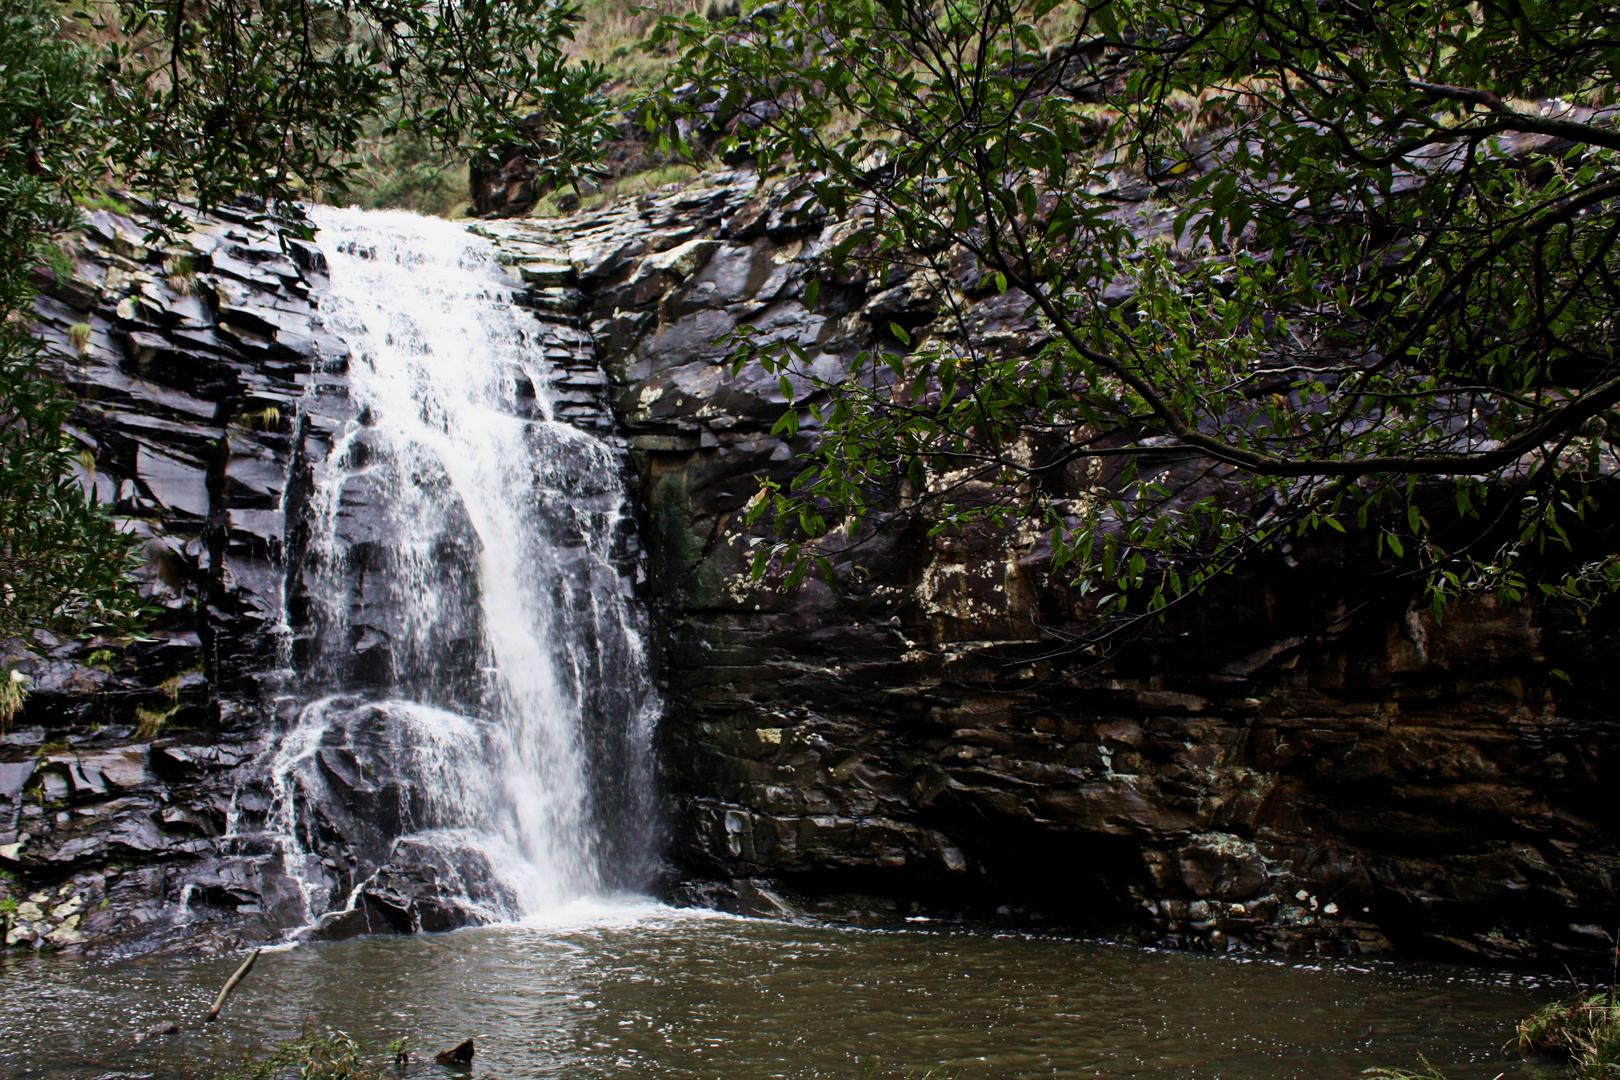 Lower Sheoak Falls